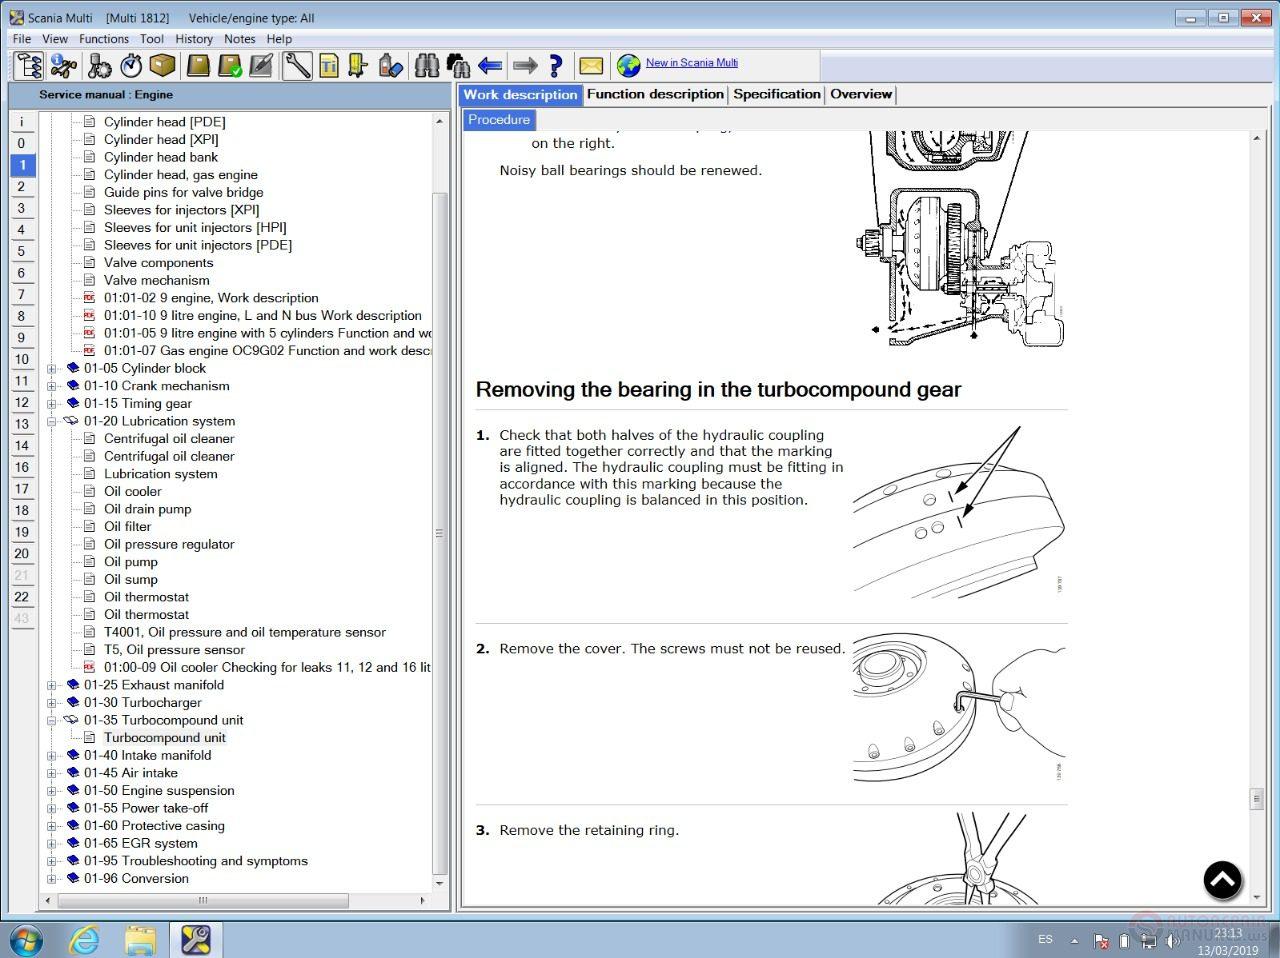 Scania_Multi_122018_Full_Instruction7